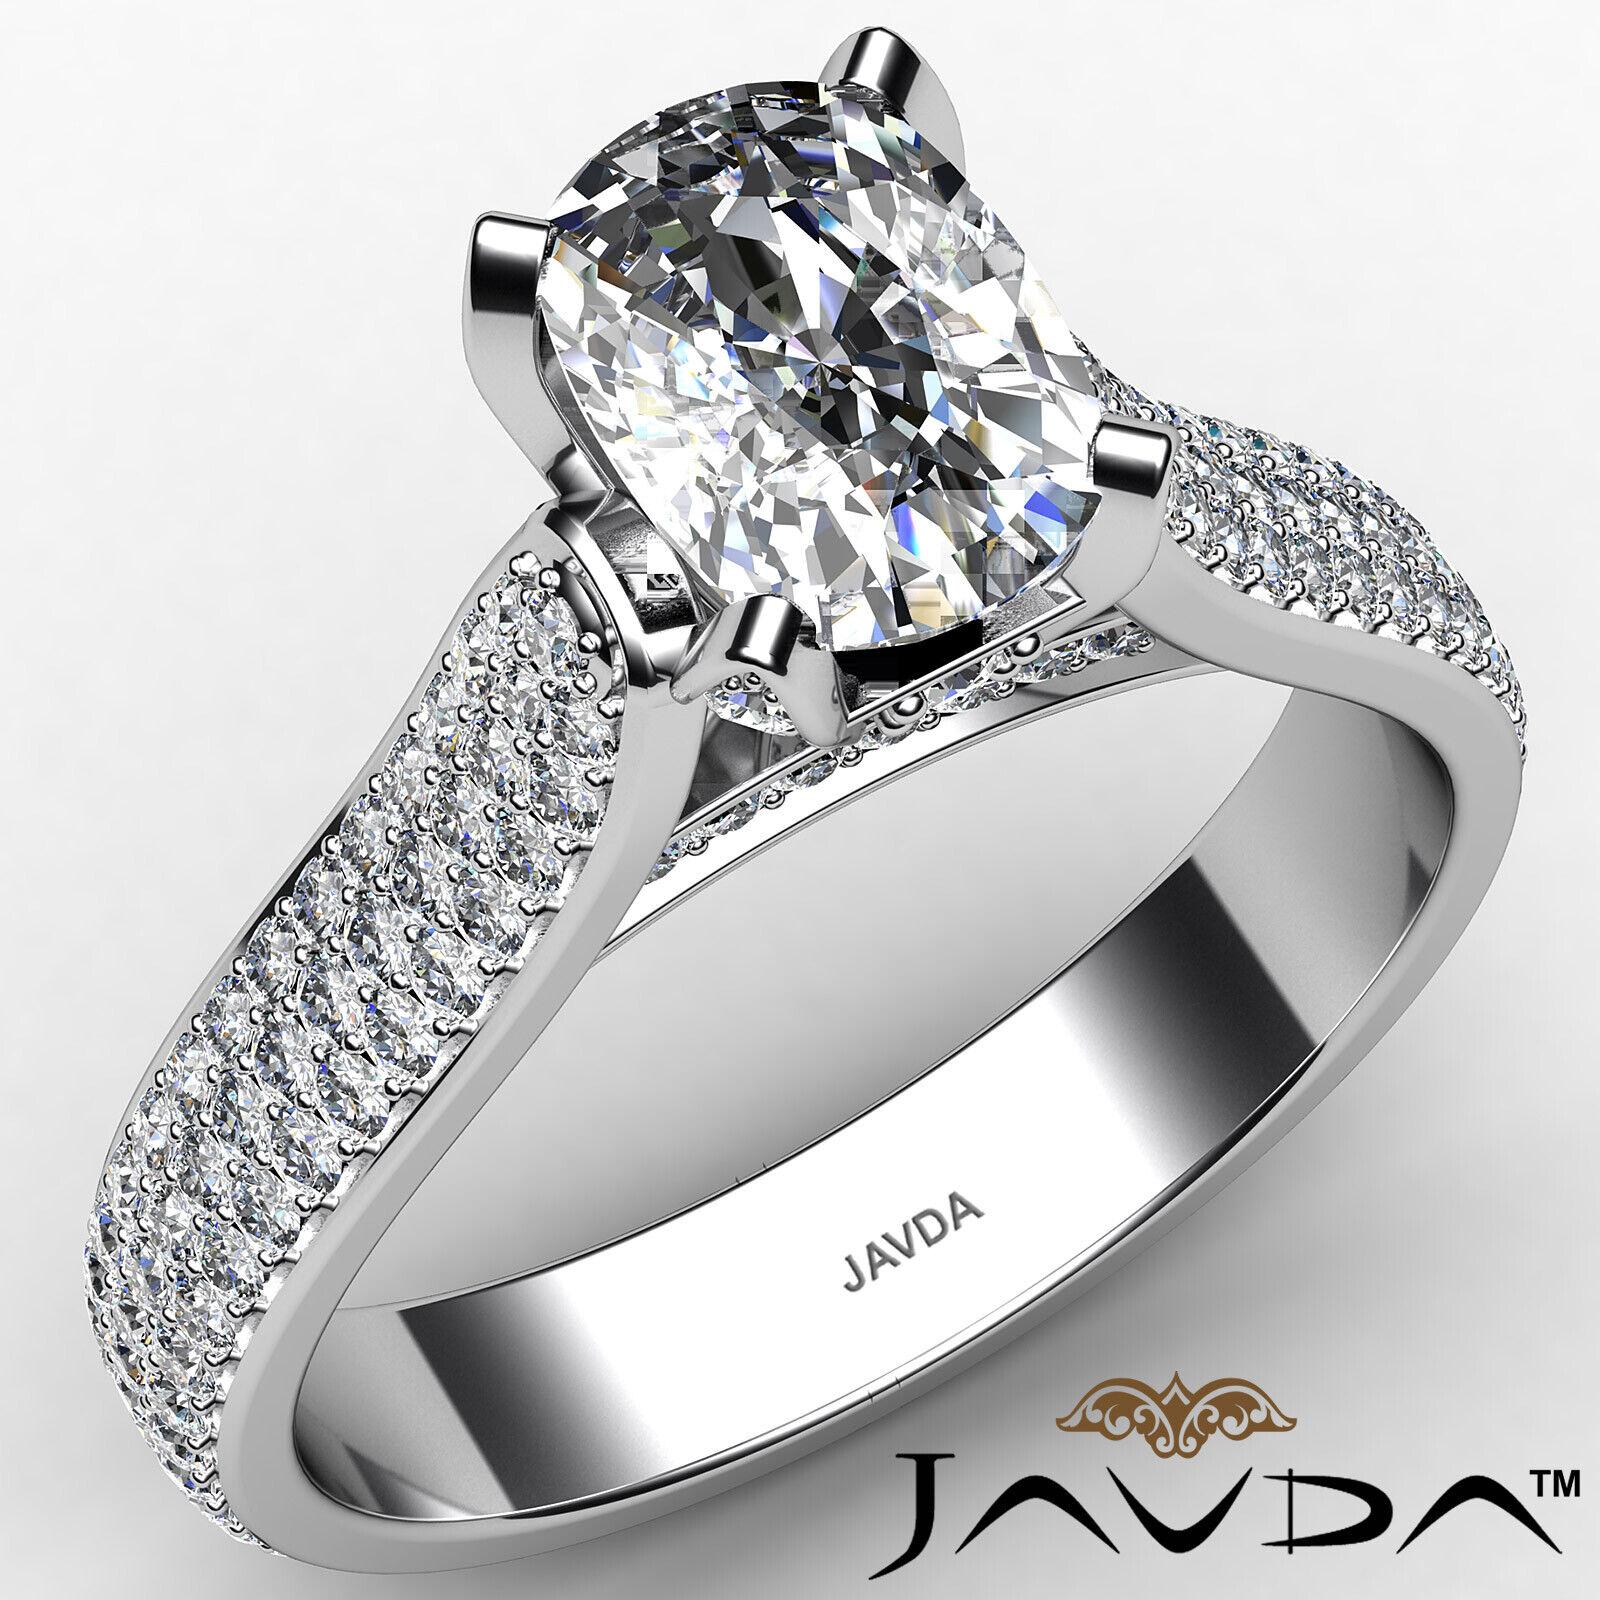 3 Row Shank Cushion Diamond Engagement Ring GIA E Color & SI1 clarity 2.35 ctw